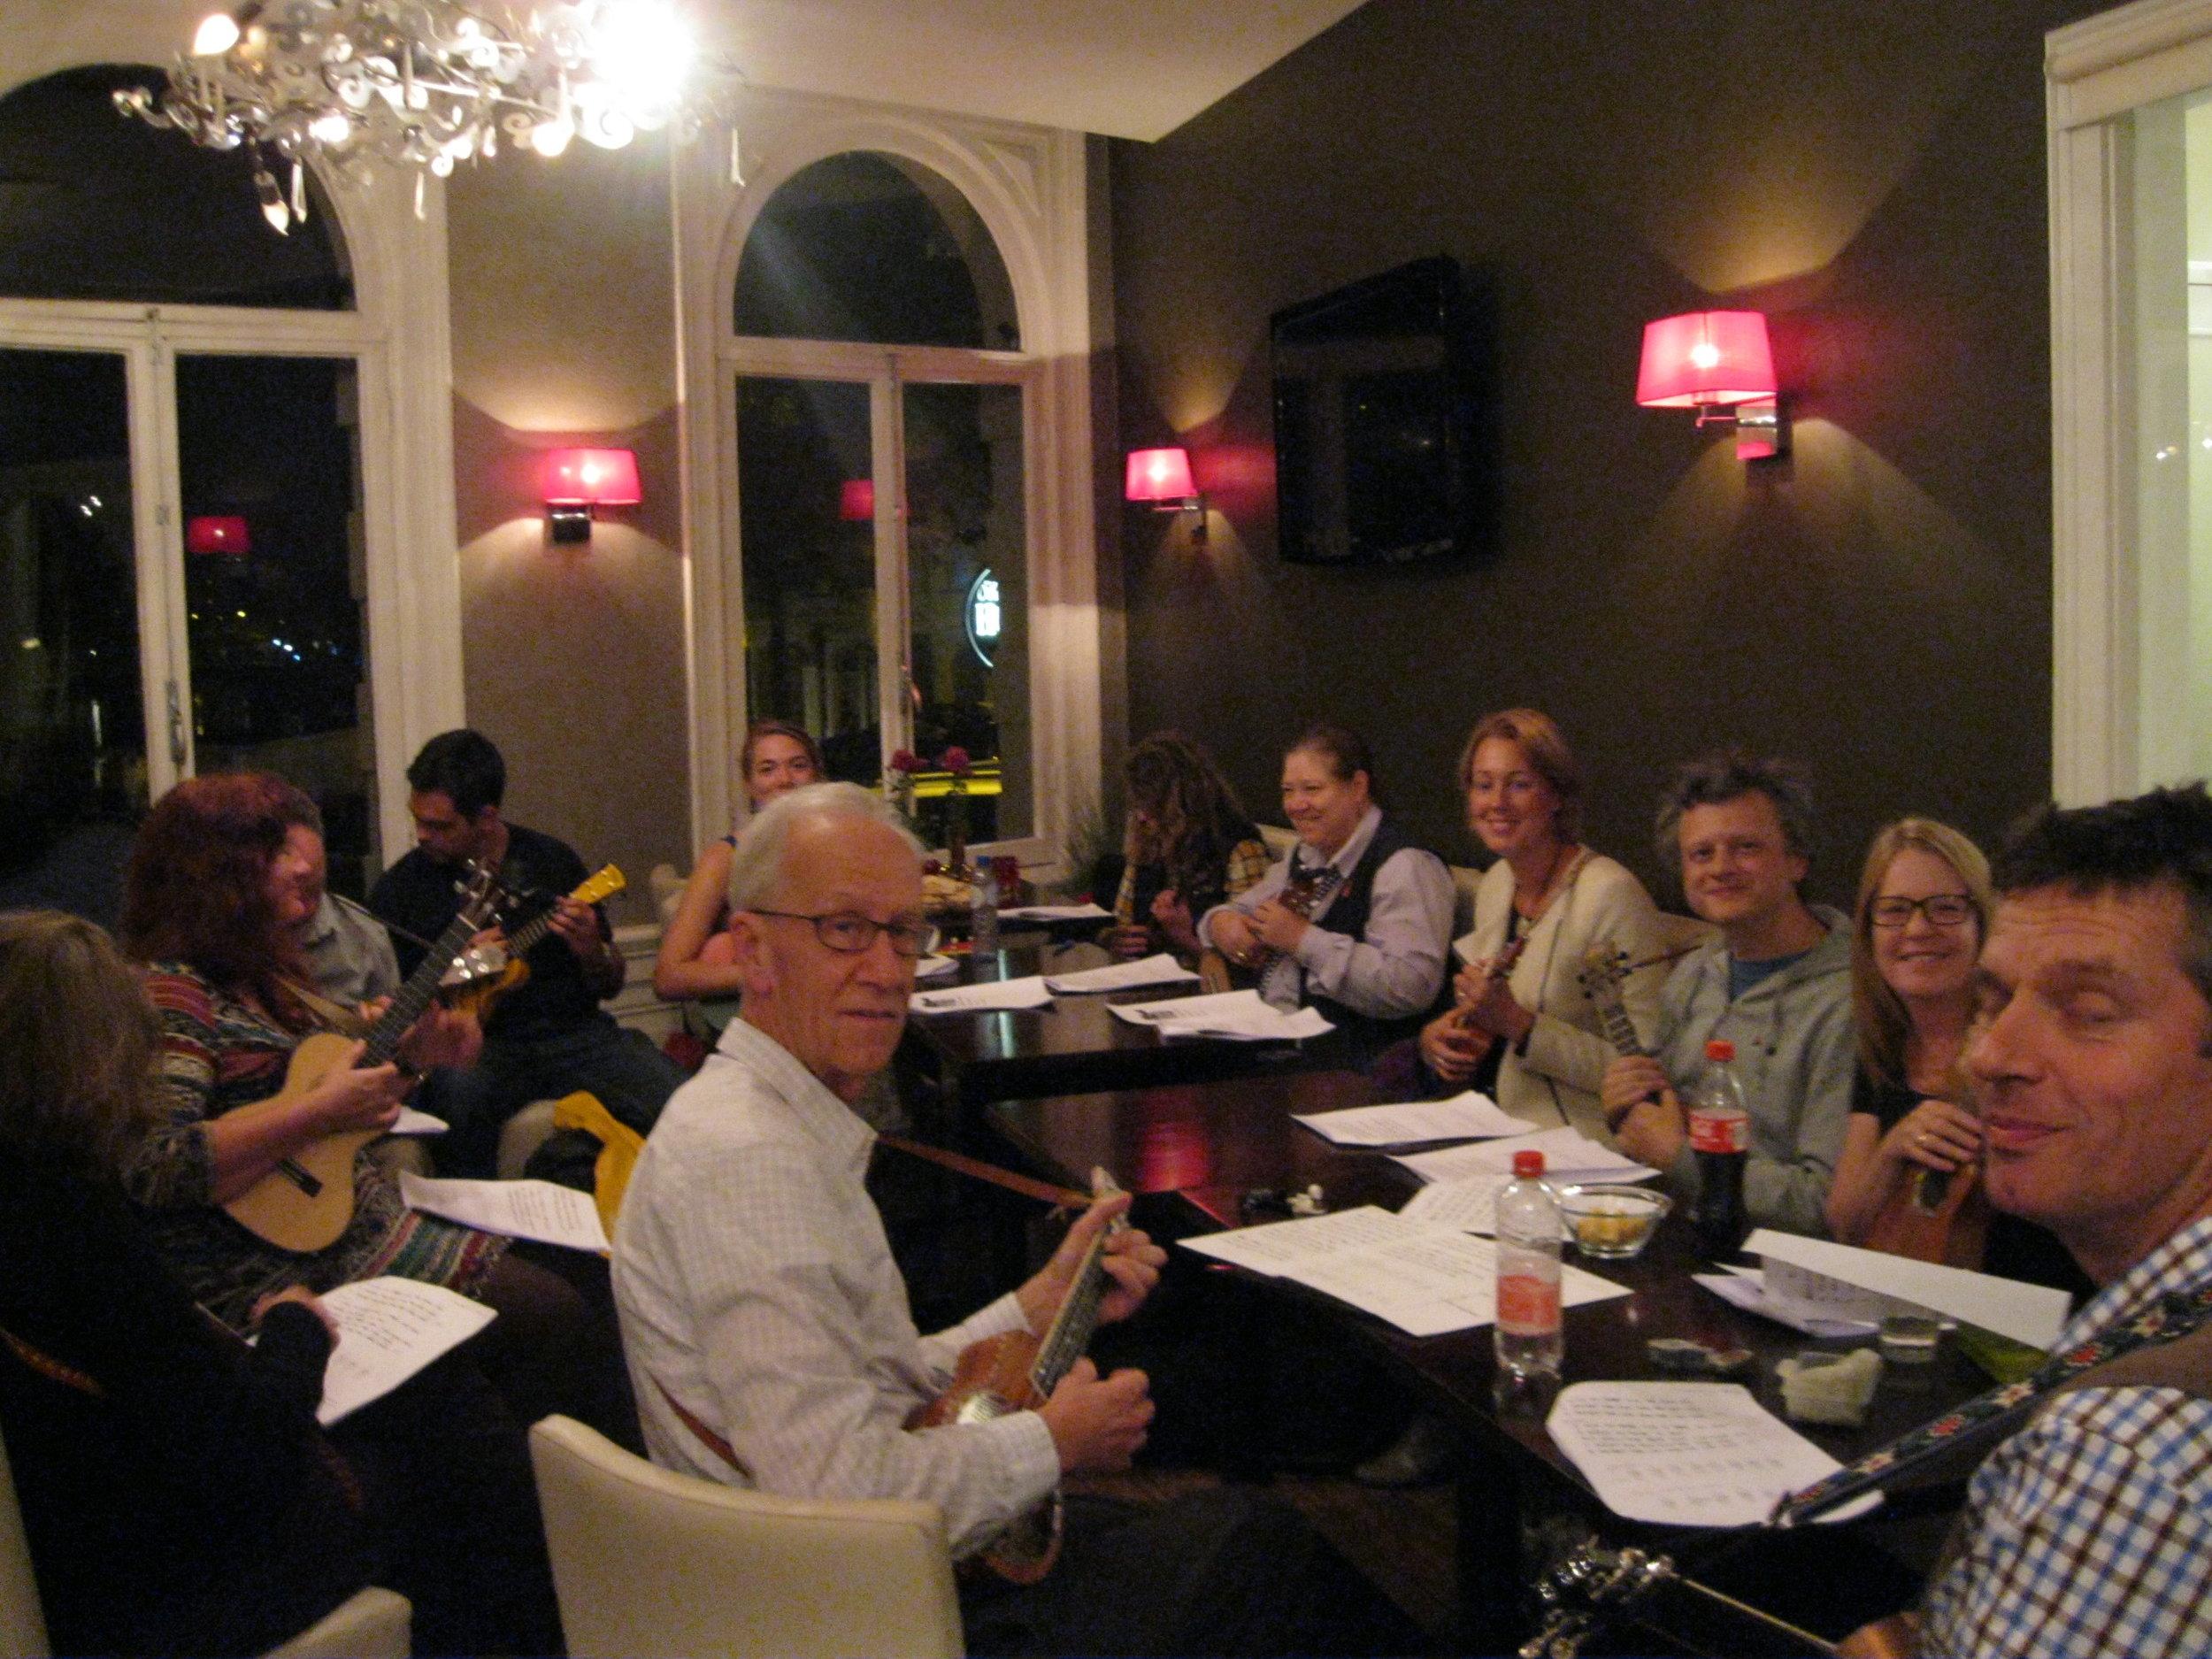 Giving ukulele workshop Amsterdam, Holland 2015.